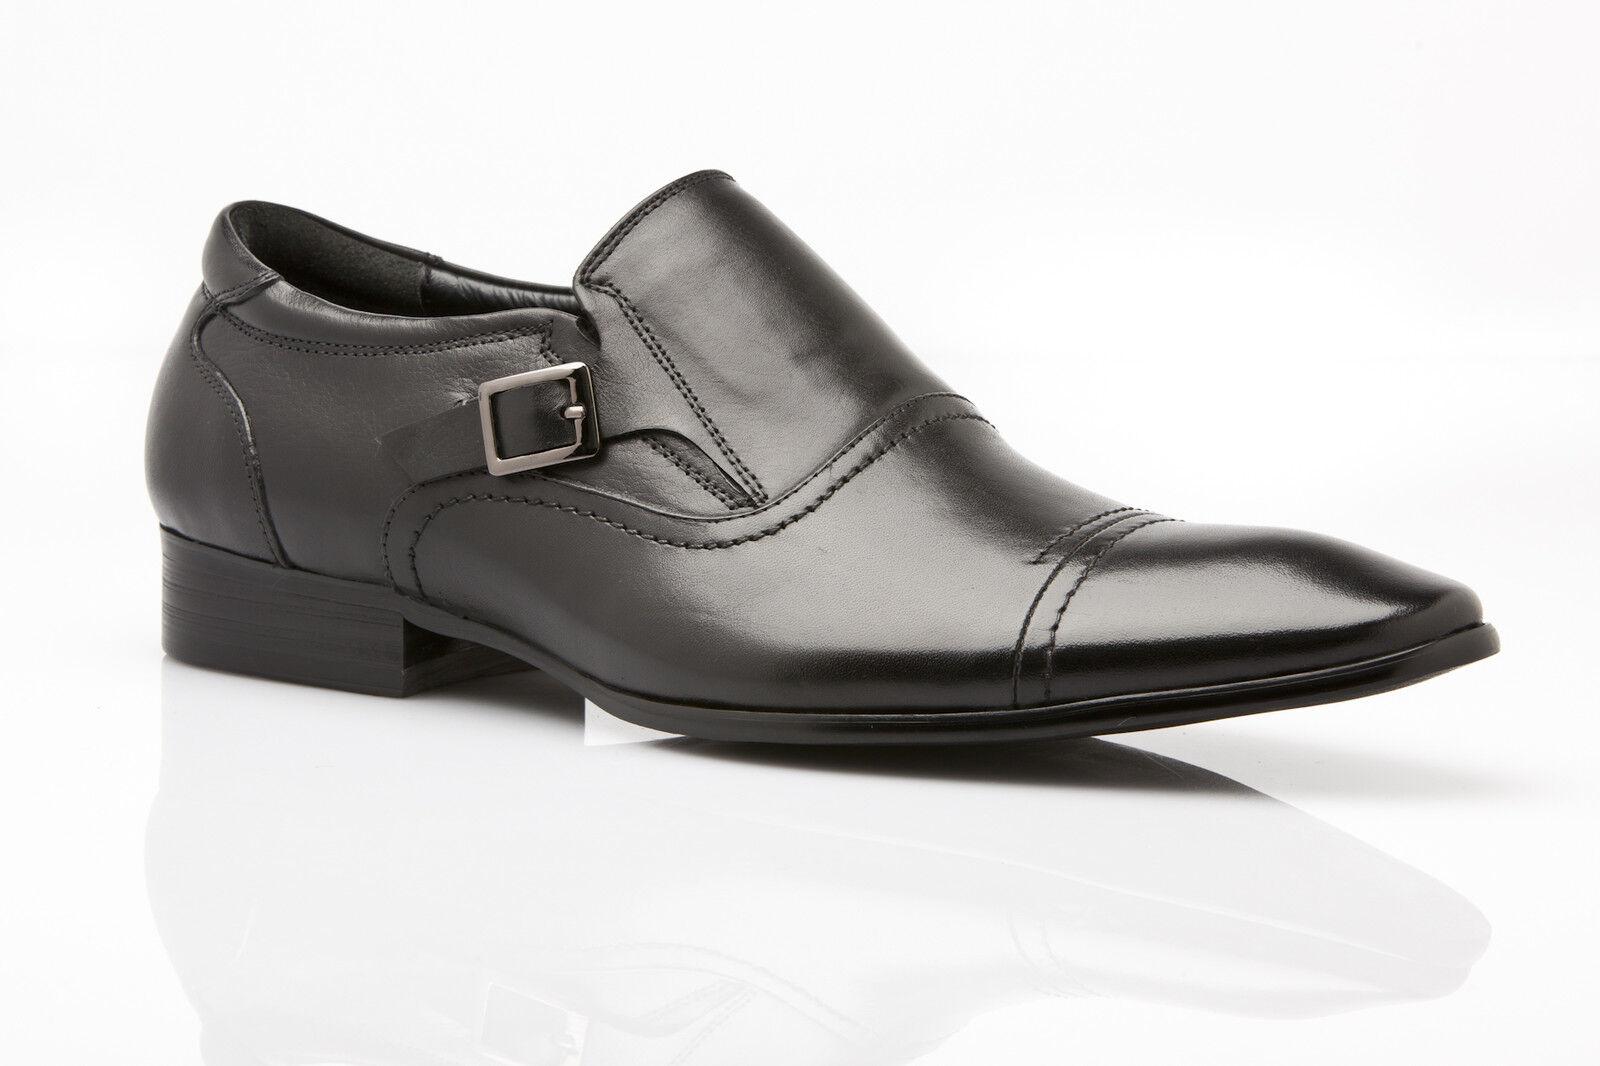 NEW MENS ZASEL DRESS BLACK LEATHER SLIP ON BUCKLE DRESS FORMAL CASUAL WORK SHOES